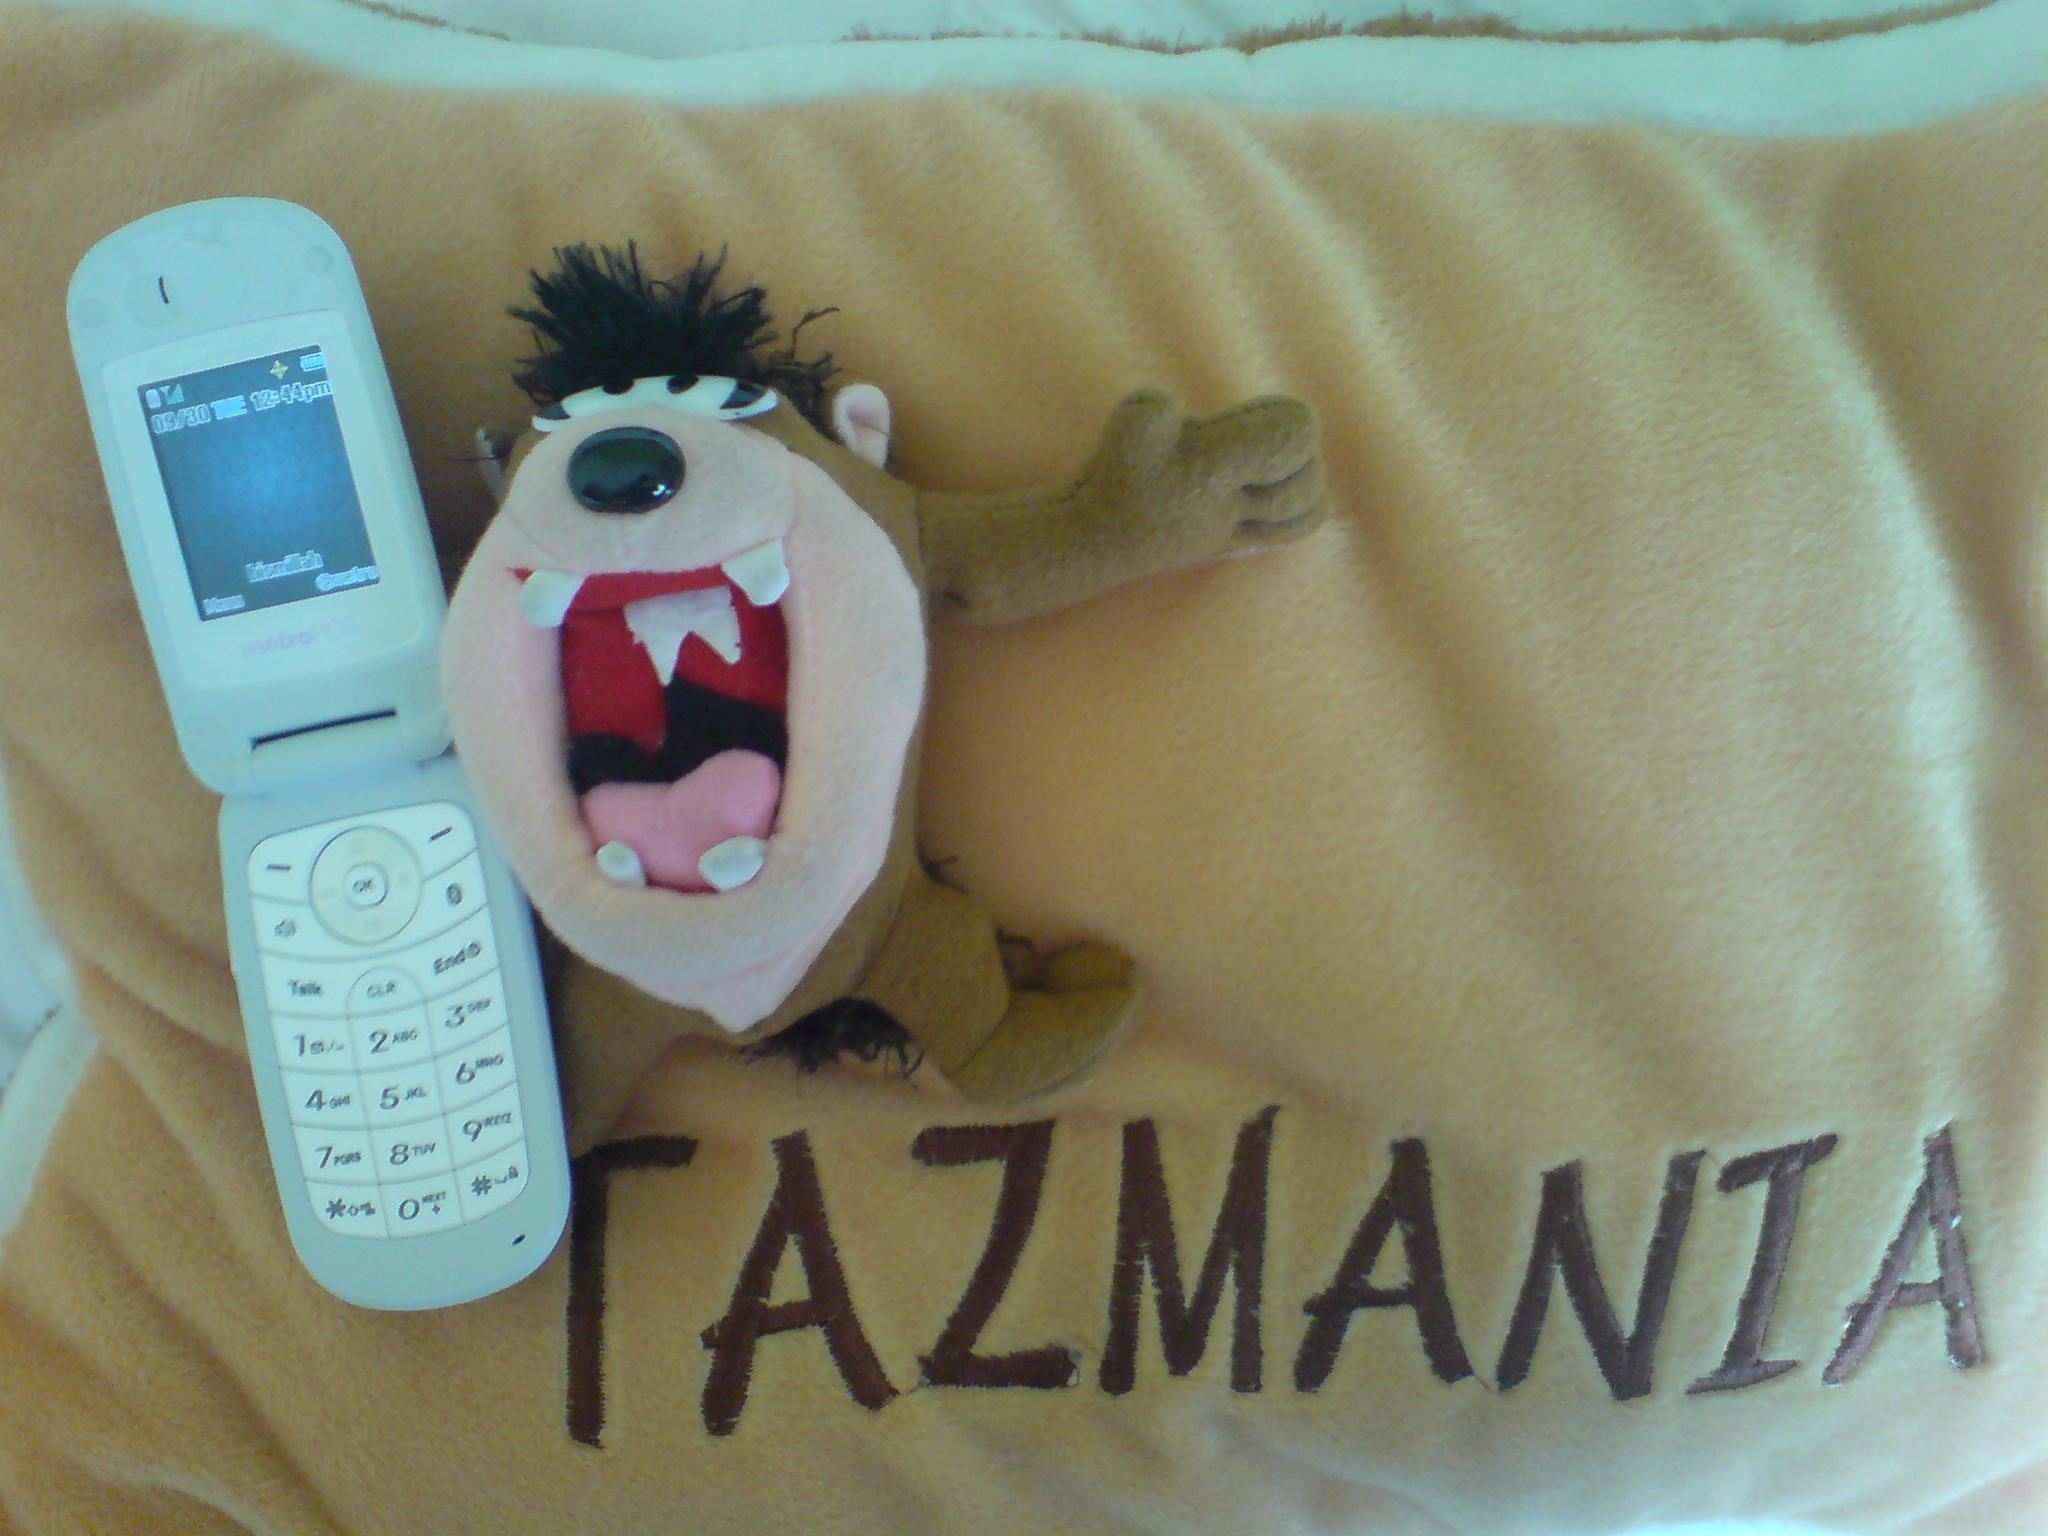 sitazman1